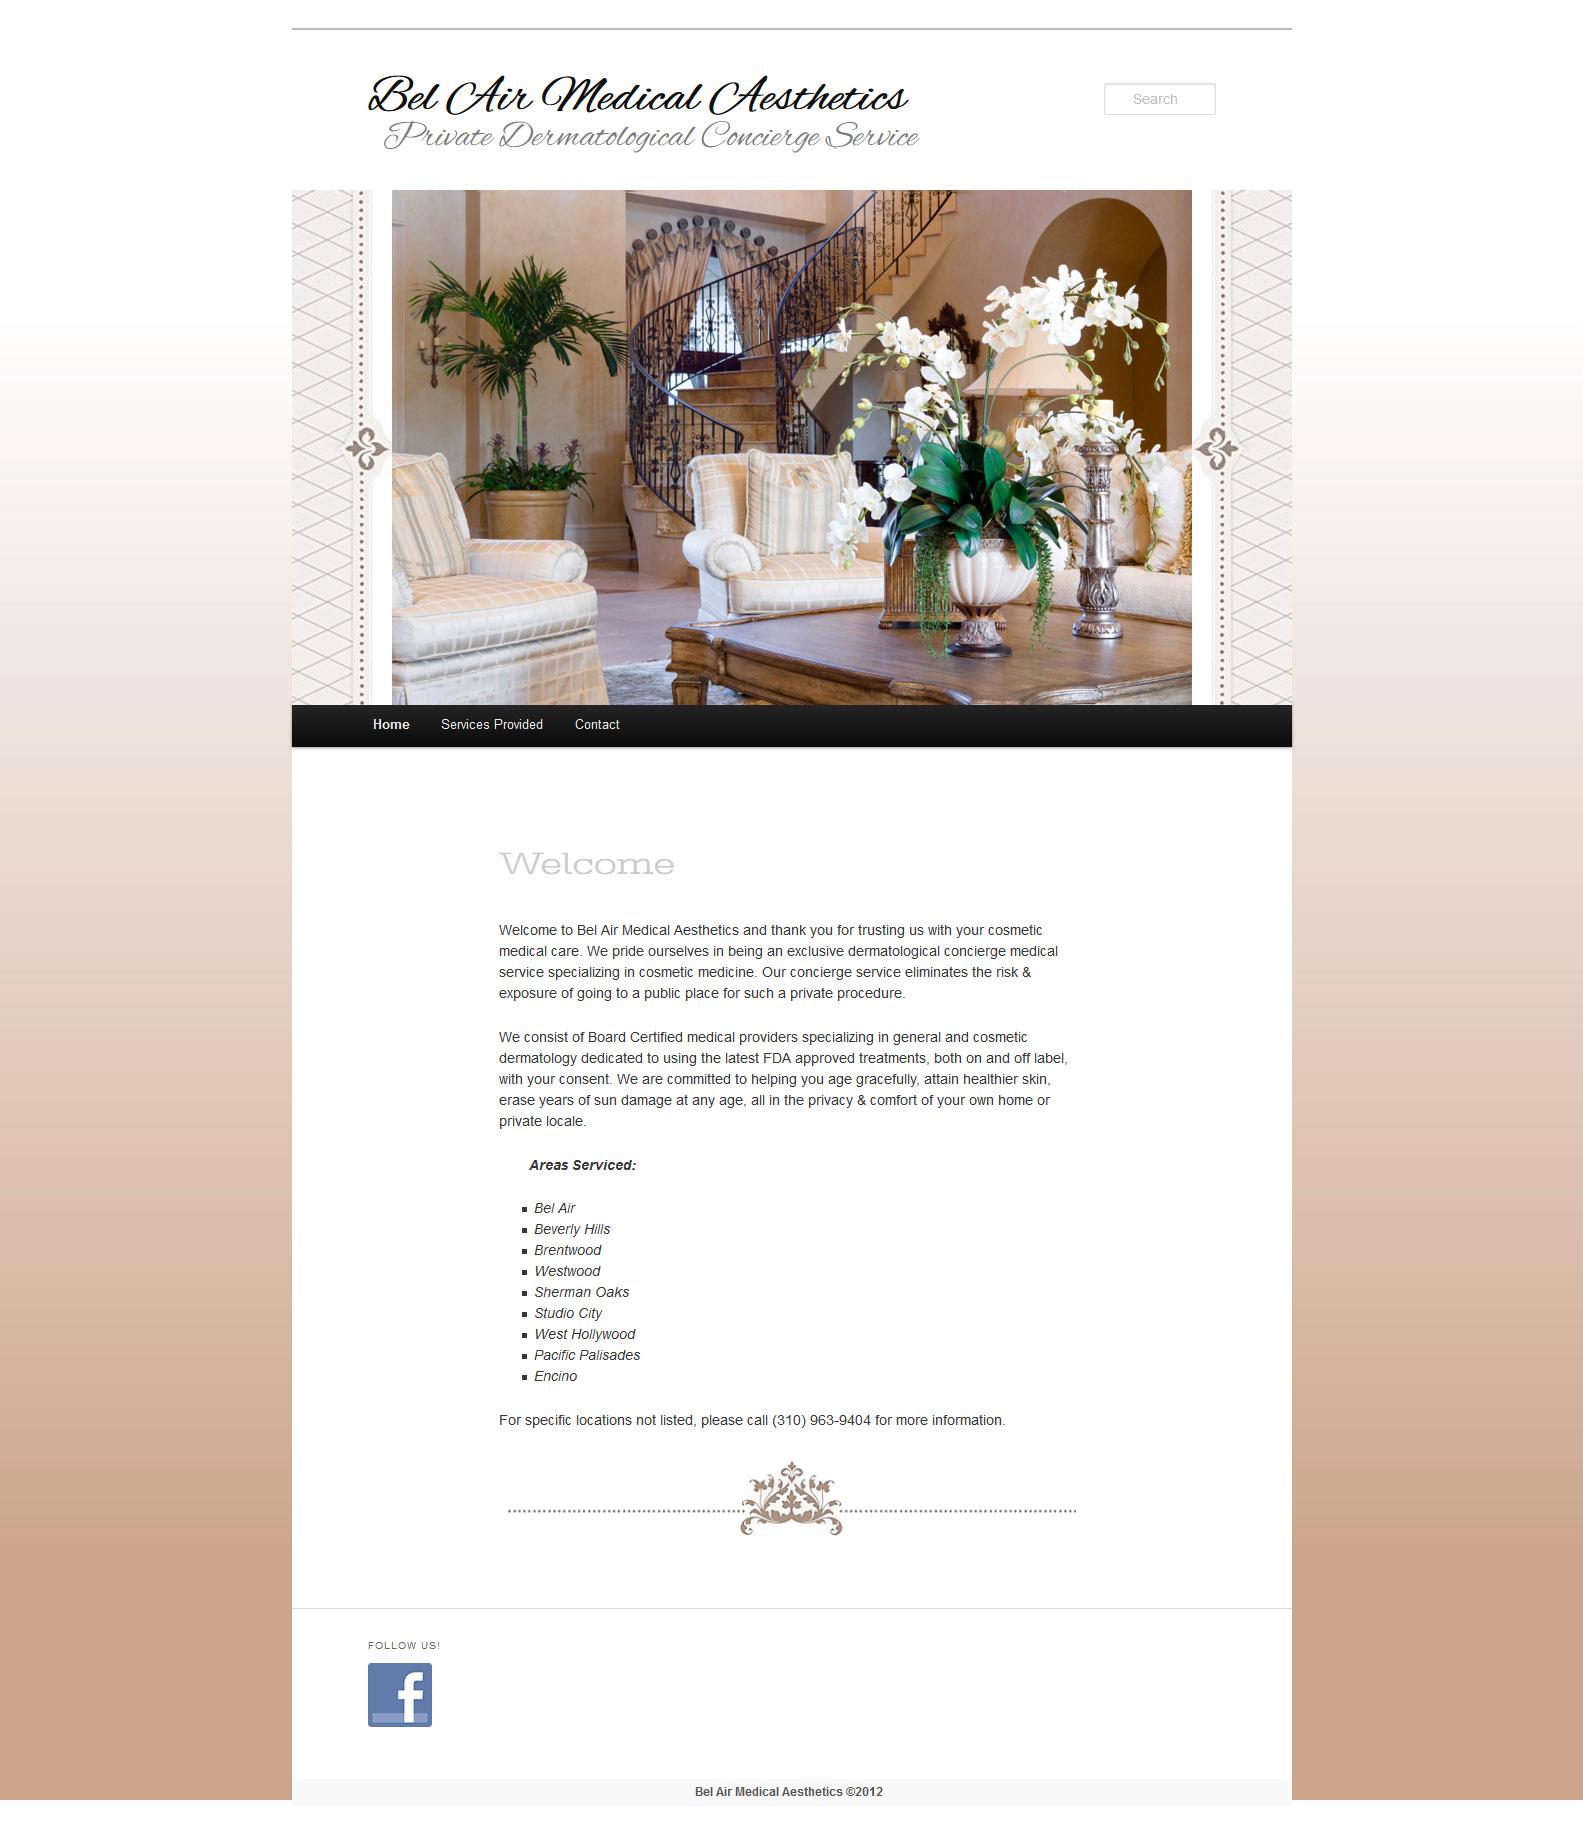 Bel Air Medical Aesthetics Web Design and Implementation